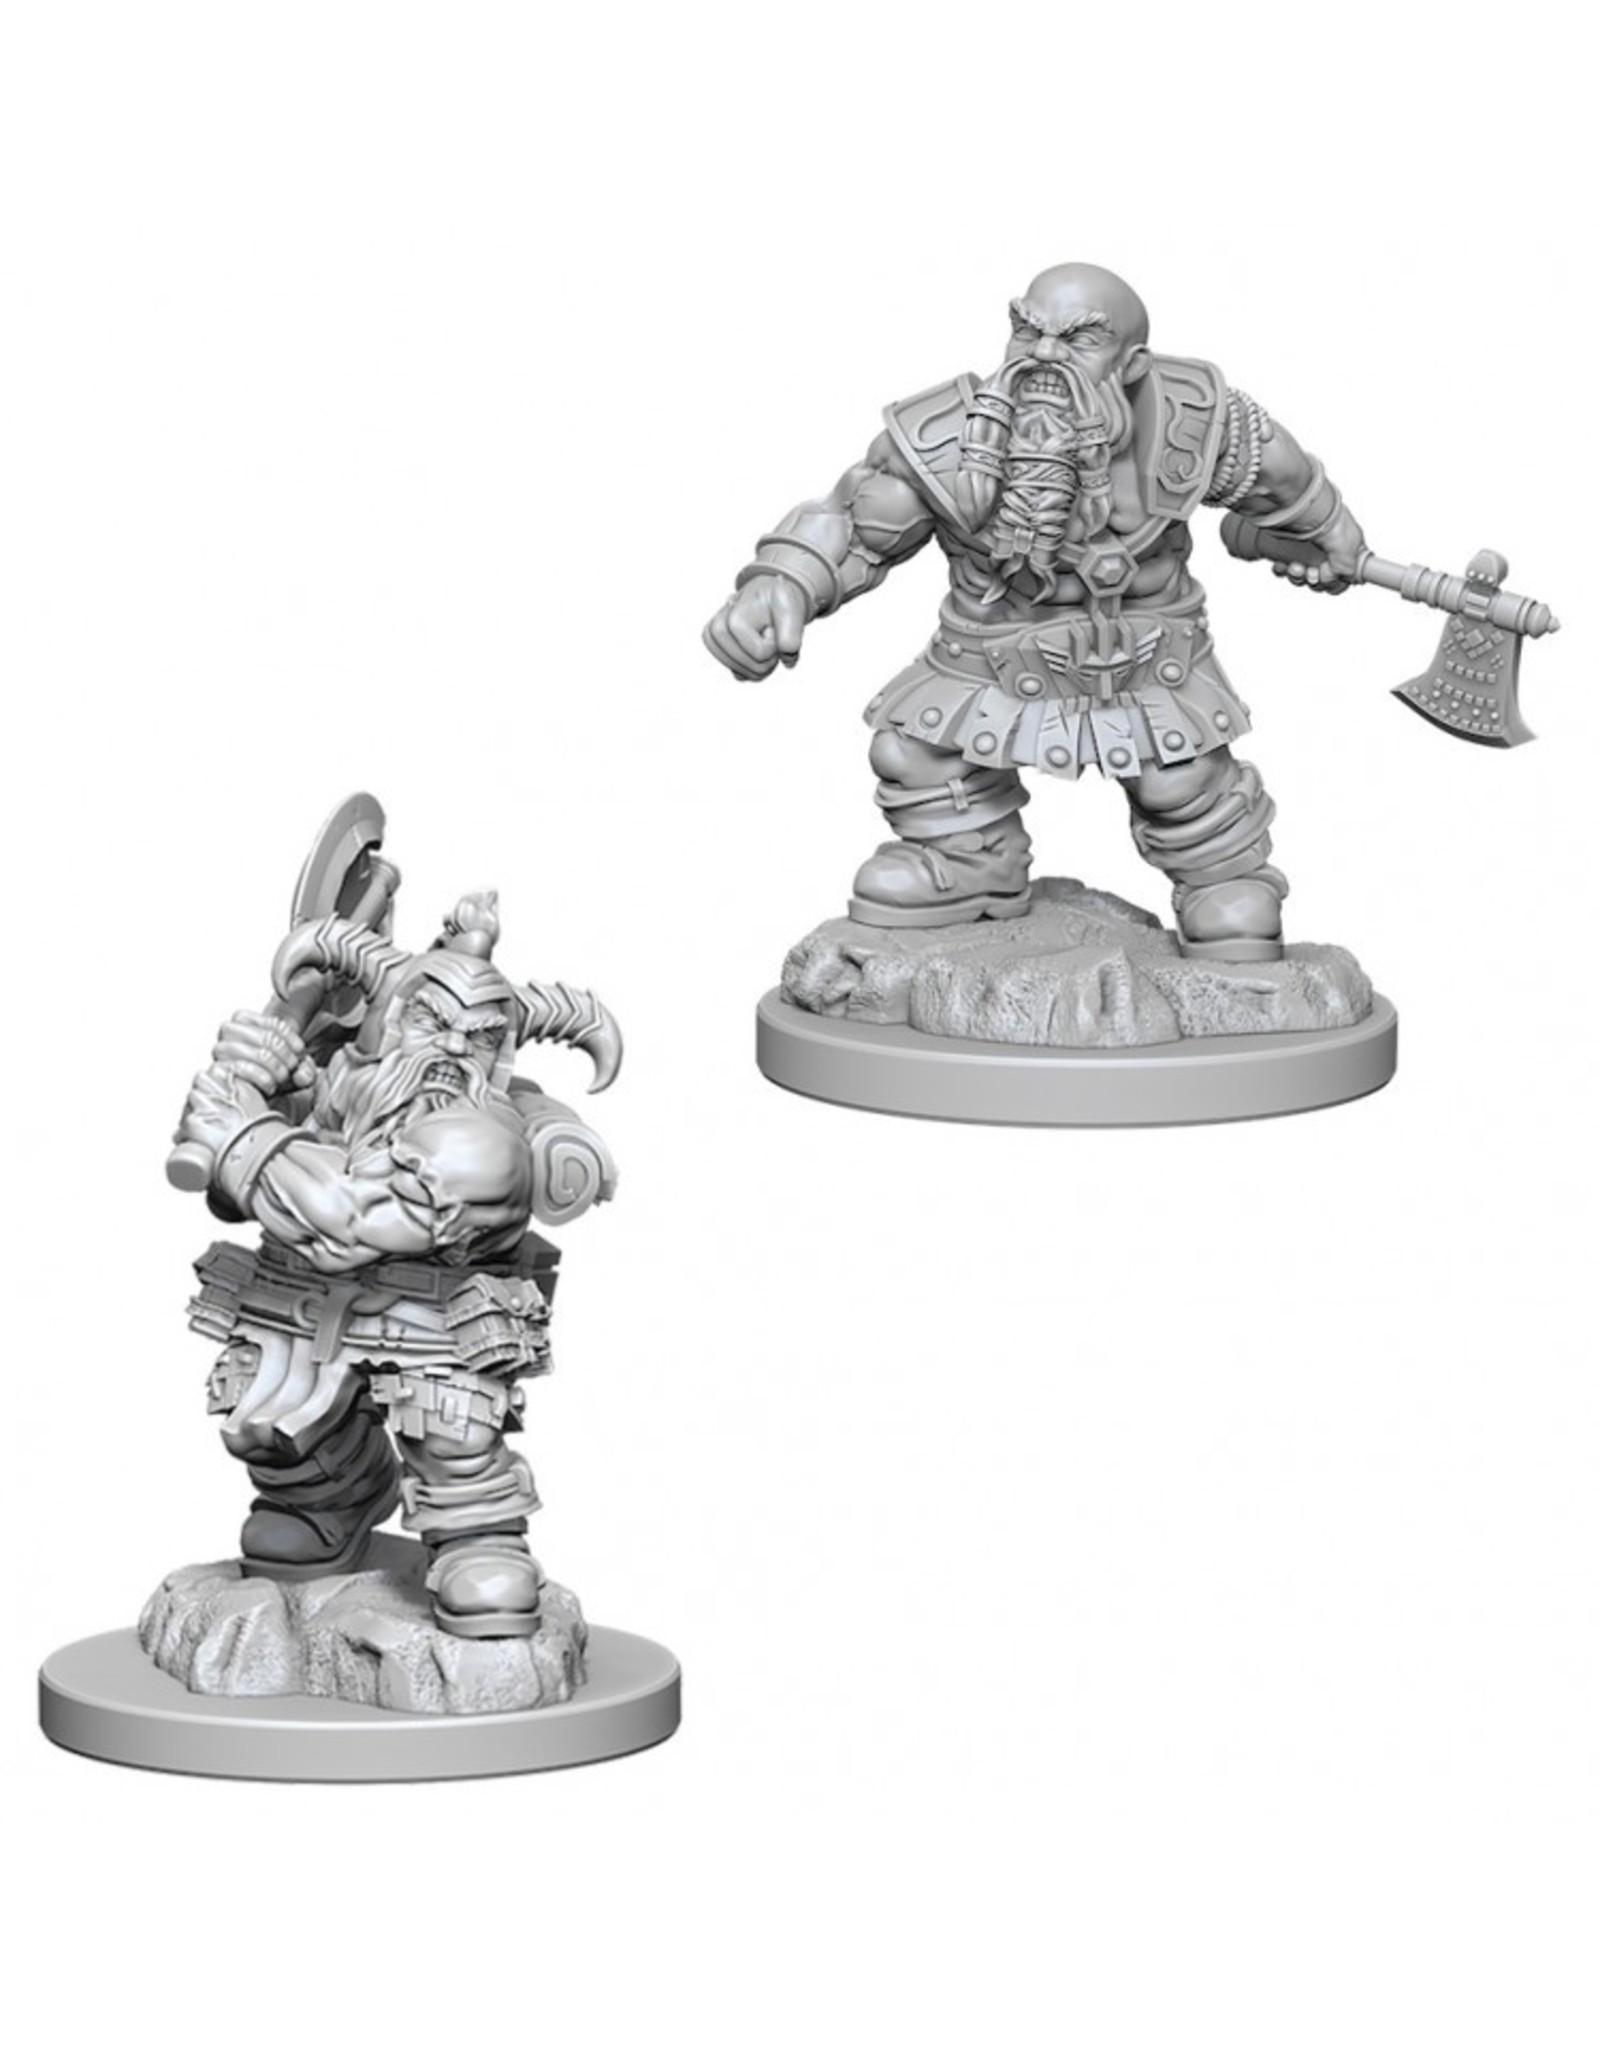 Wiz Kids D&D NMU: Male Dwarf Barbarian W6